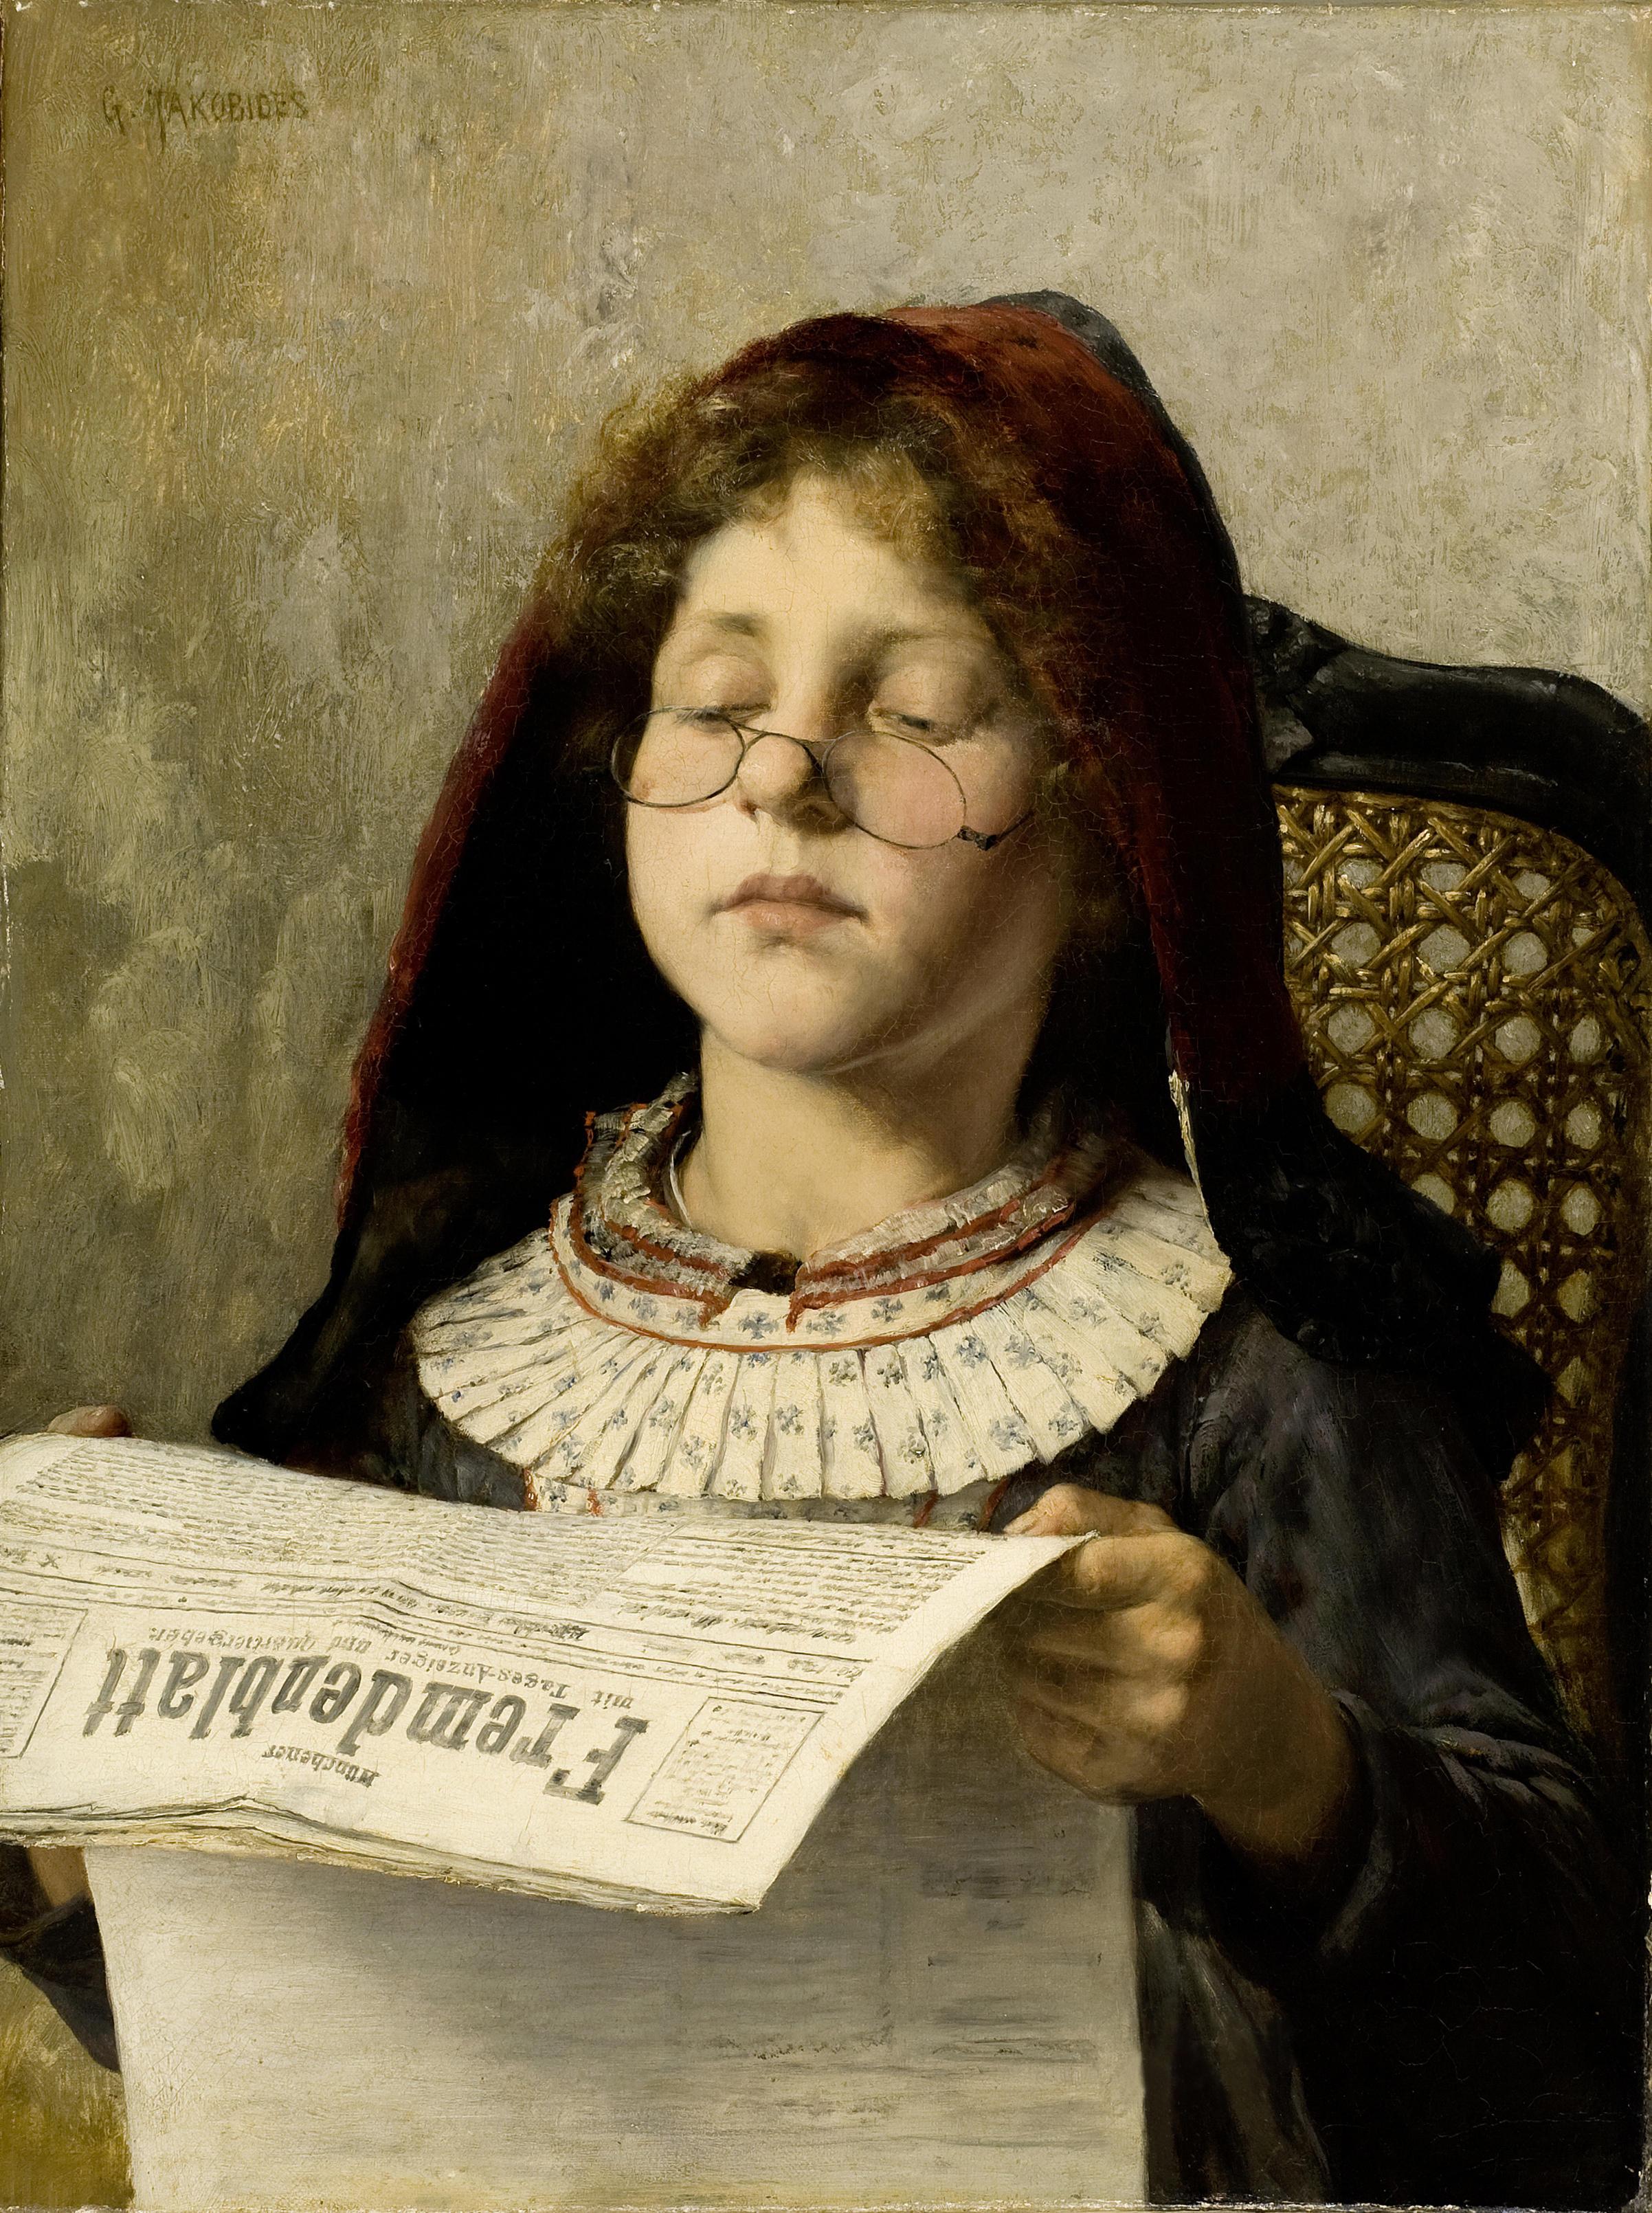 File:Georgios Jakobides Girl reading c1882.jpg.